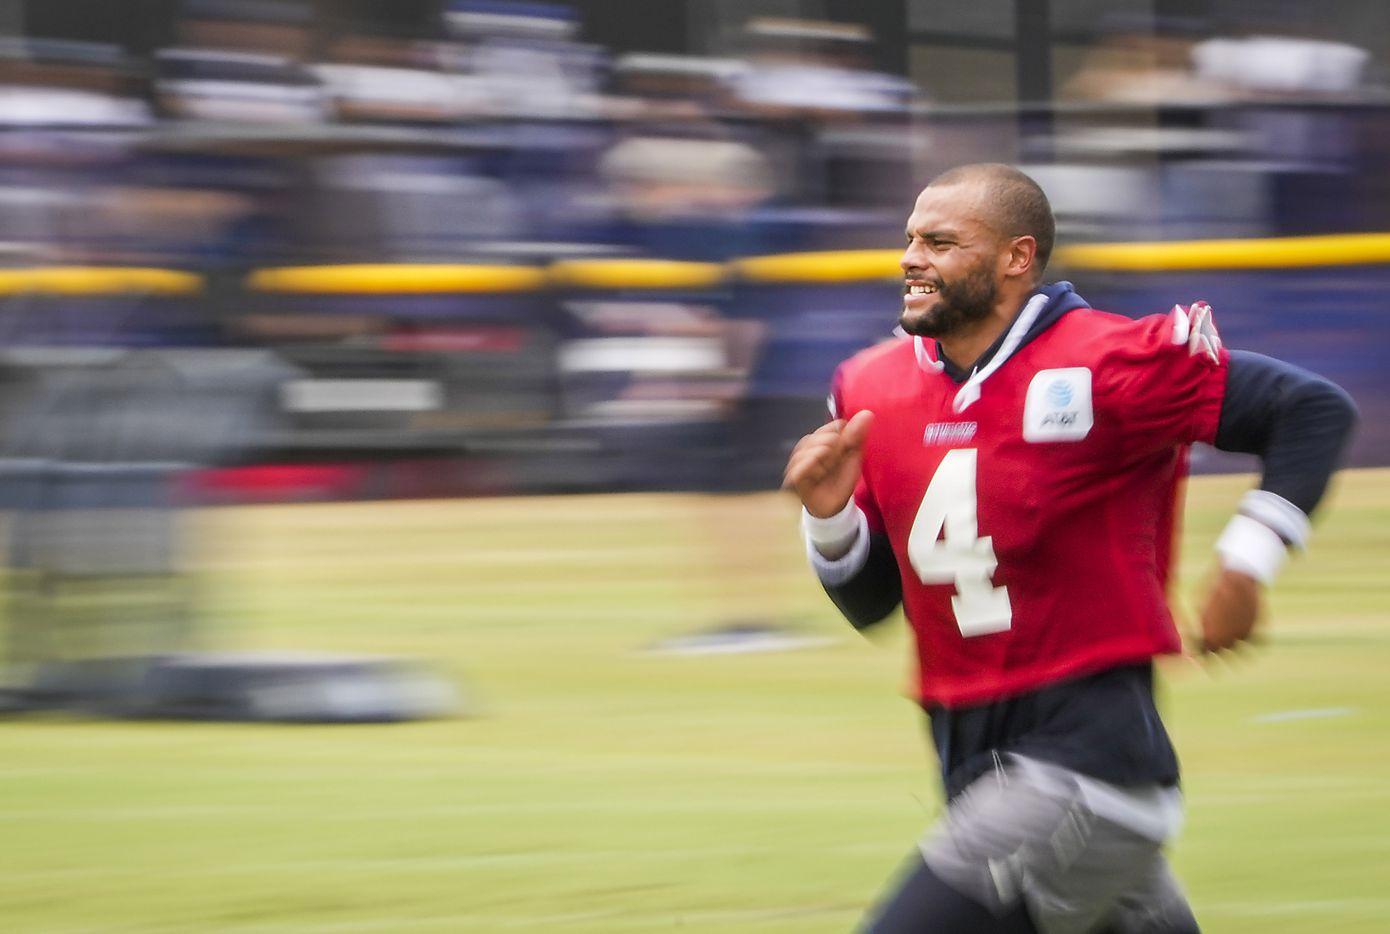 Dallas Cowboys quarterback Dak Prescott (4) runs on the field following a practice at training camp on Sunday, July 25, 2021, in Oxnard, Calif.